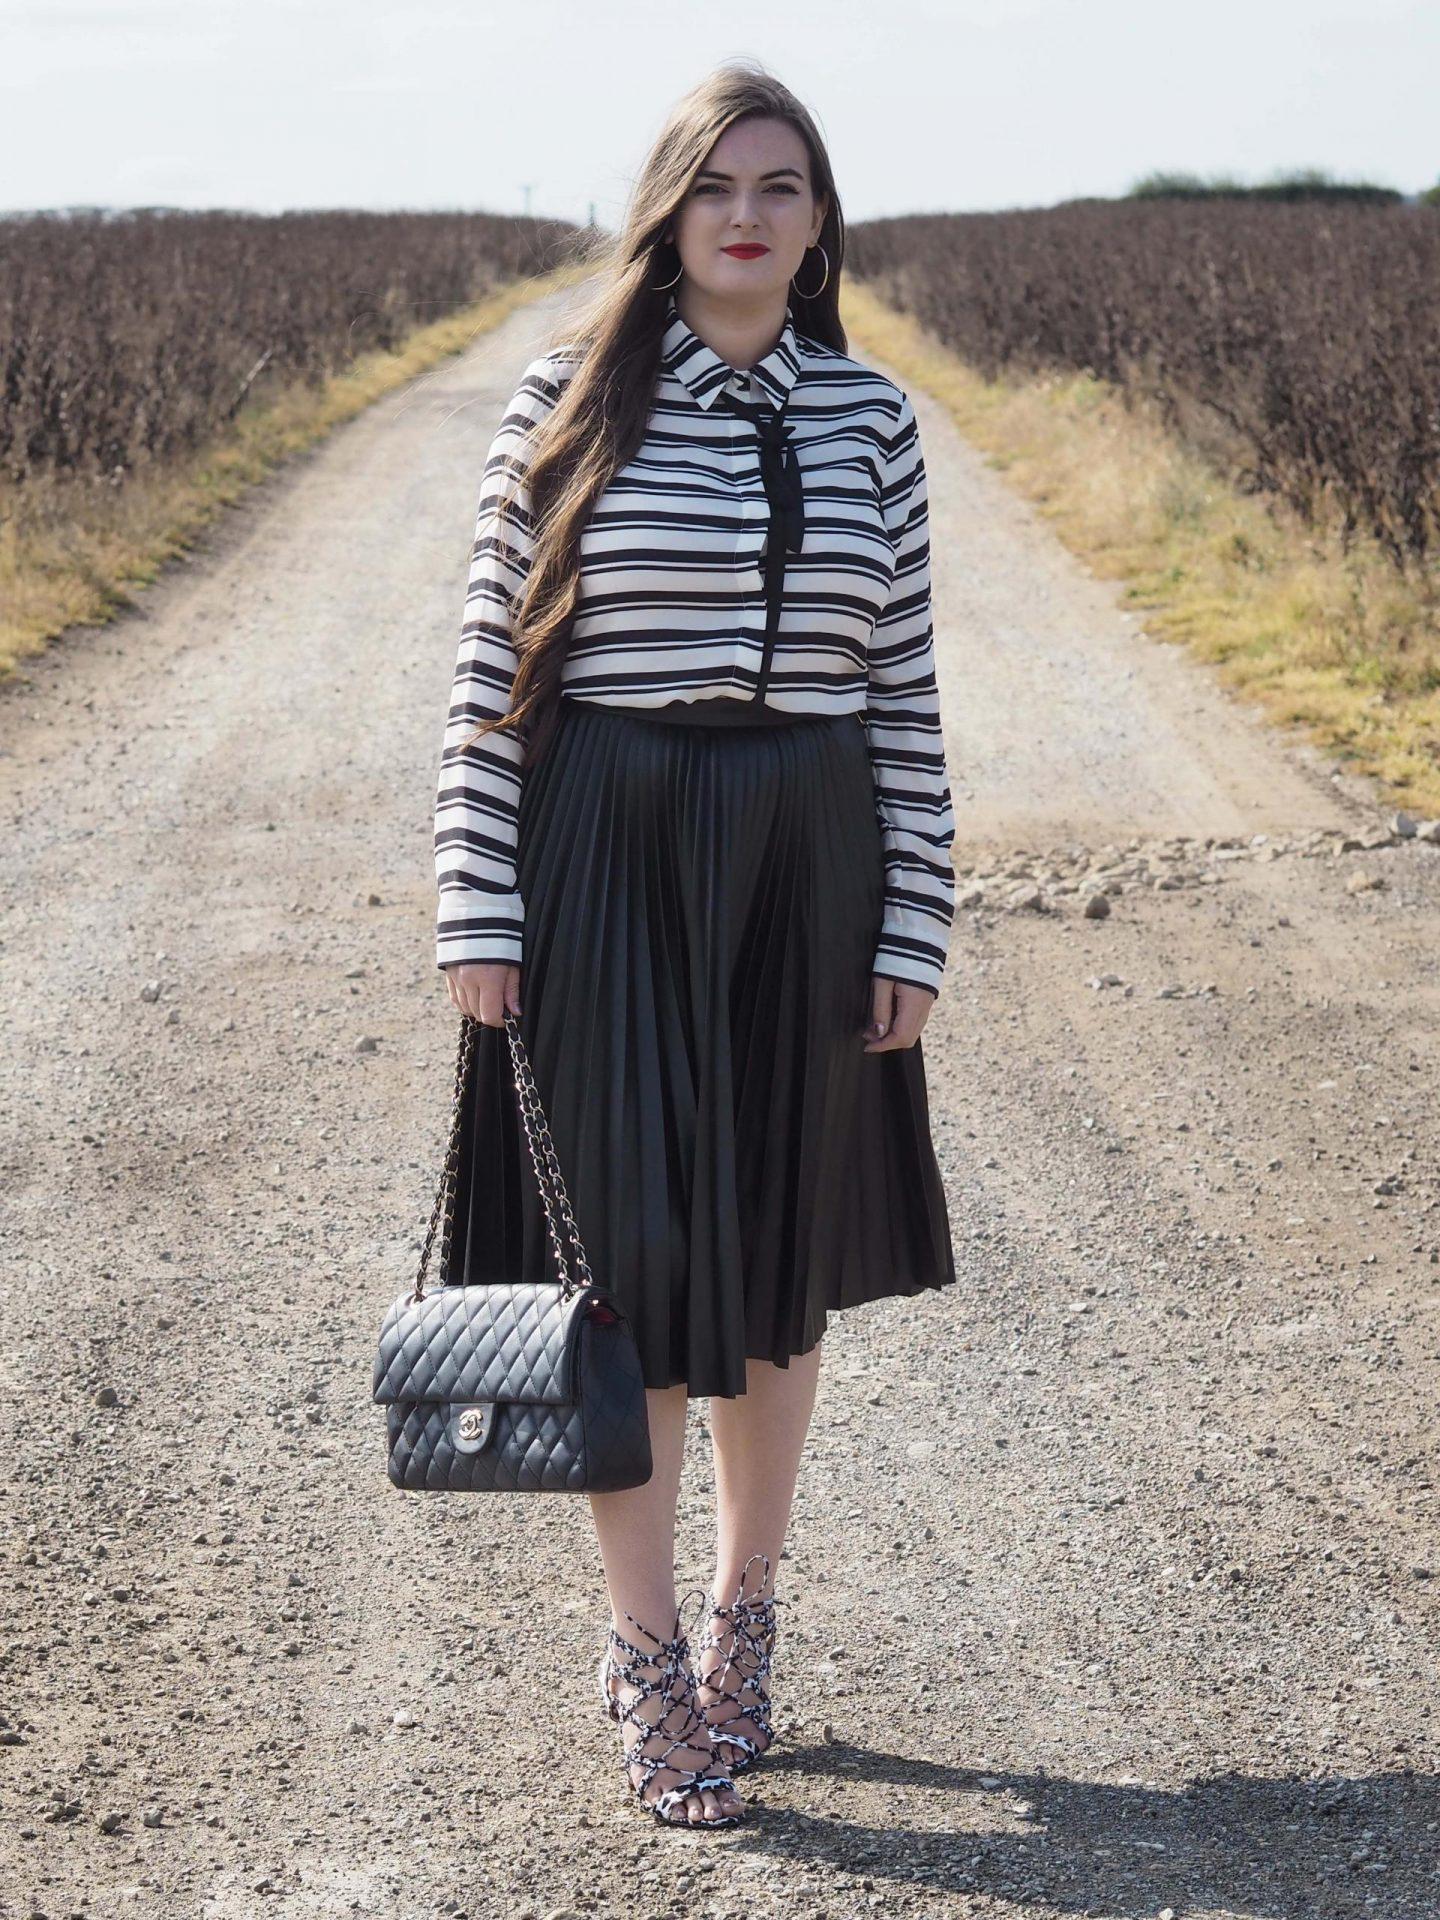 closet-leather-pleated-skirts-and-stripes-rachel-nicole-uk-blogger-4